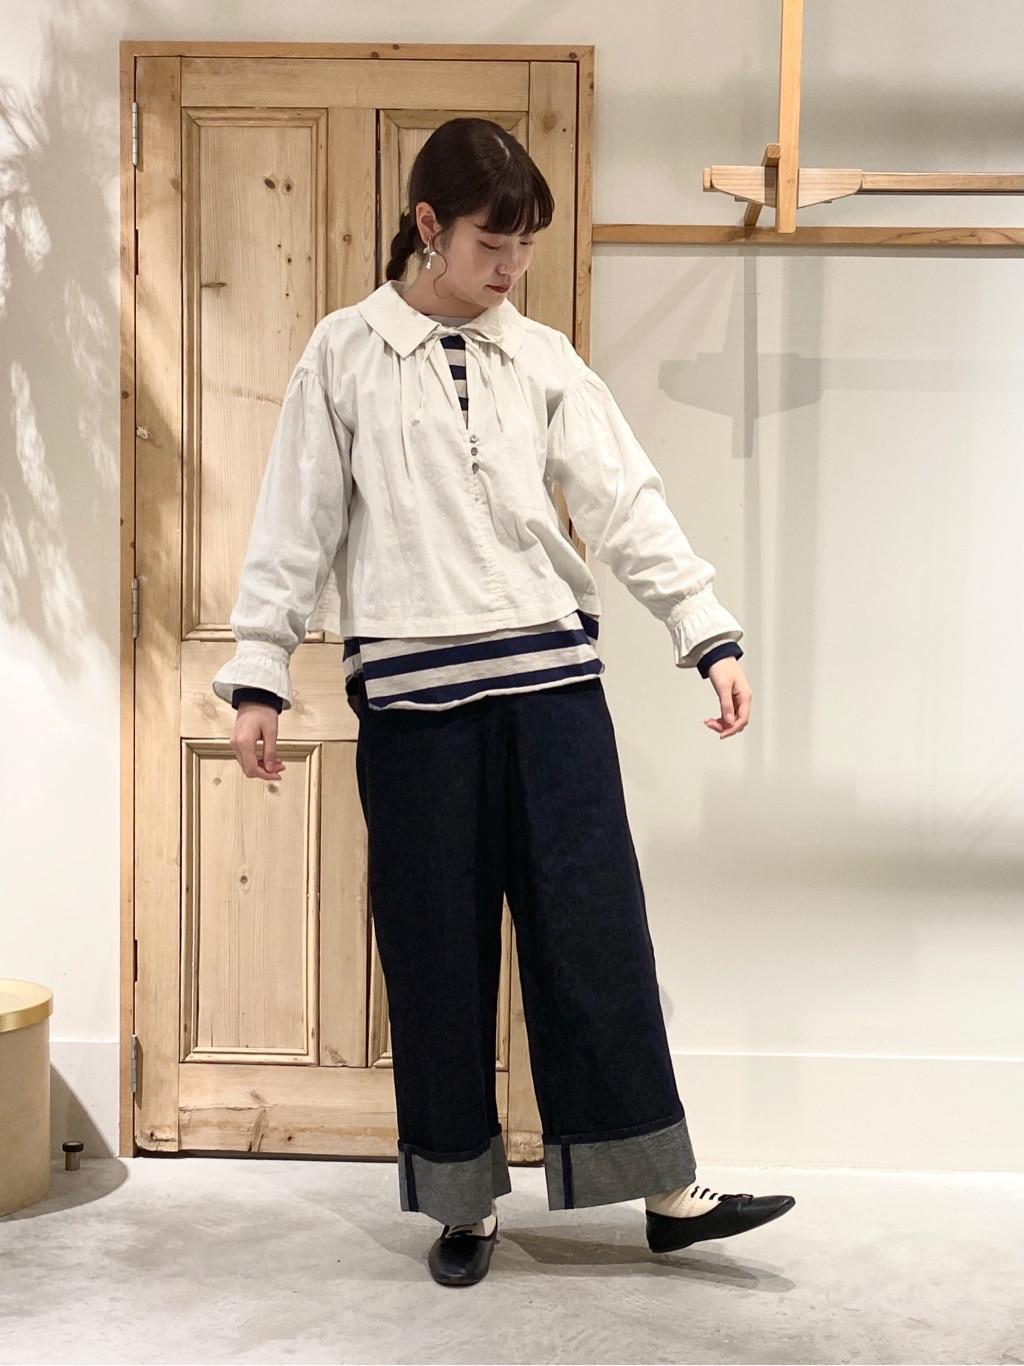 Malle chambre de charme 調布パルコ 身長:167cm 2020.12.28